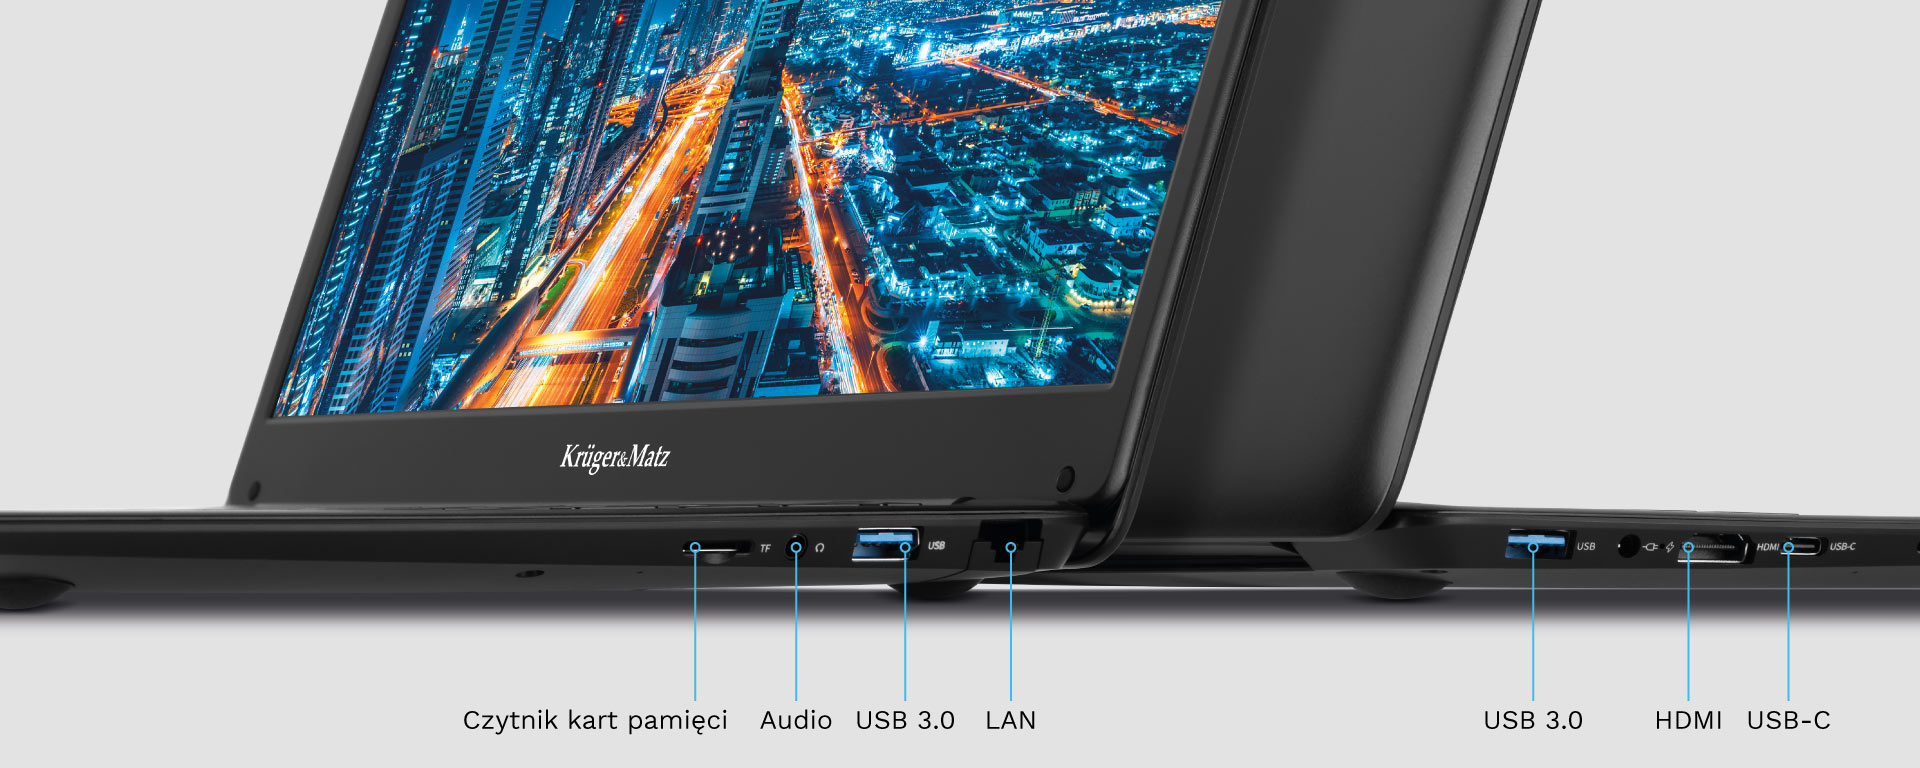 Laptop z HDMI, USB, RJ-45 i micro SD